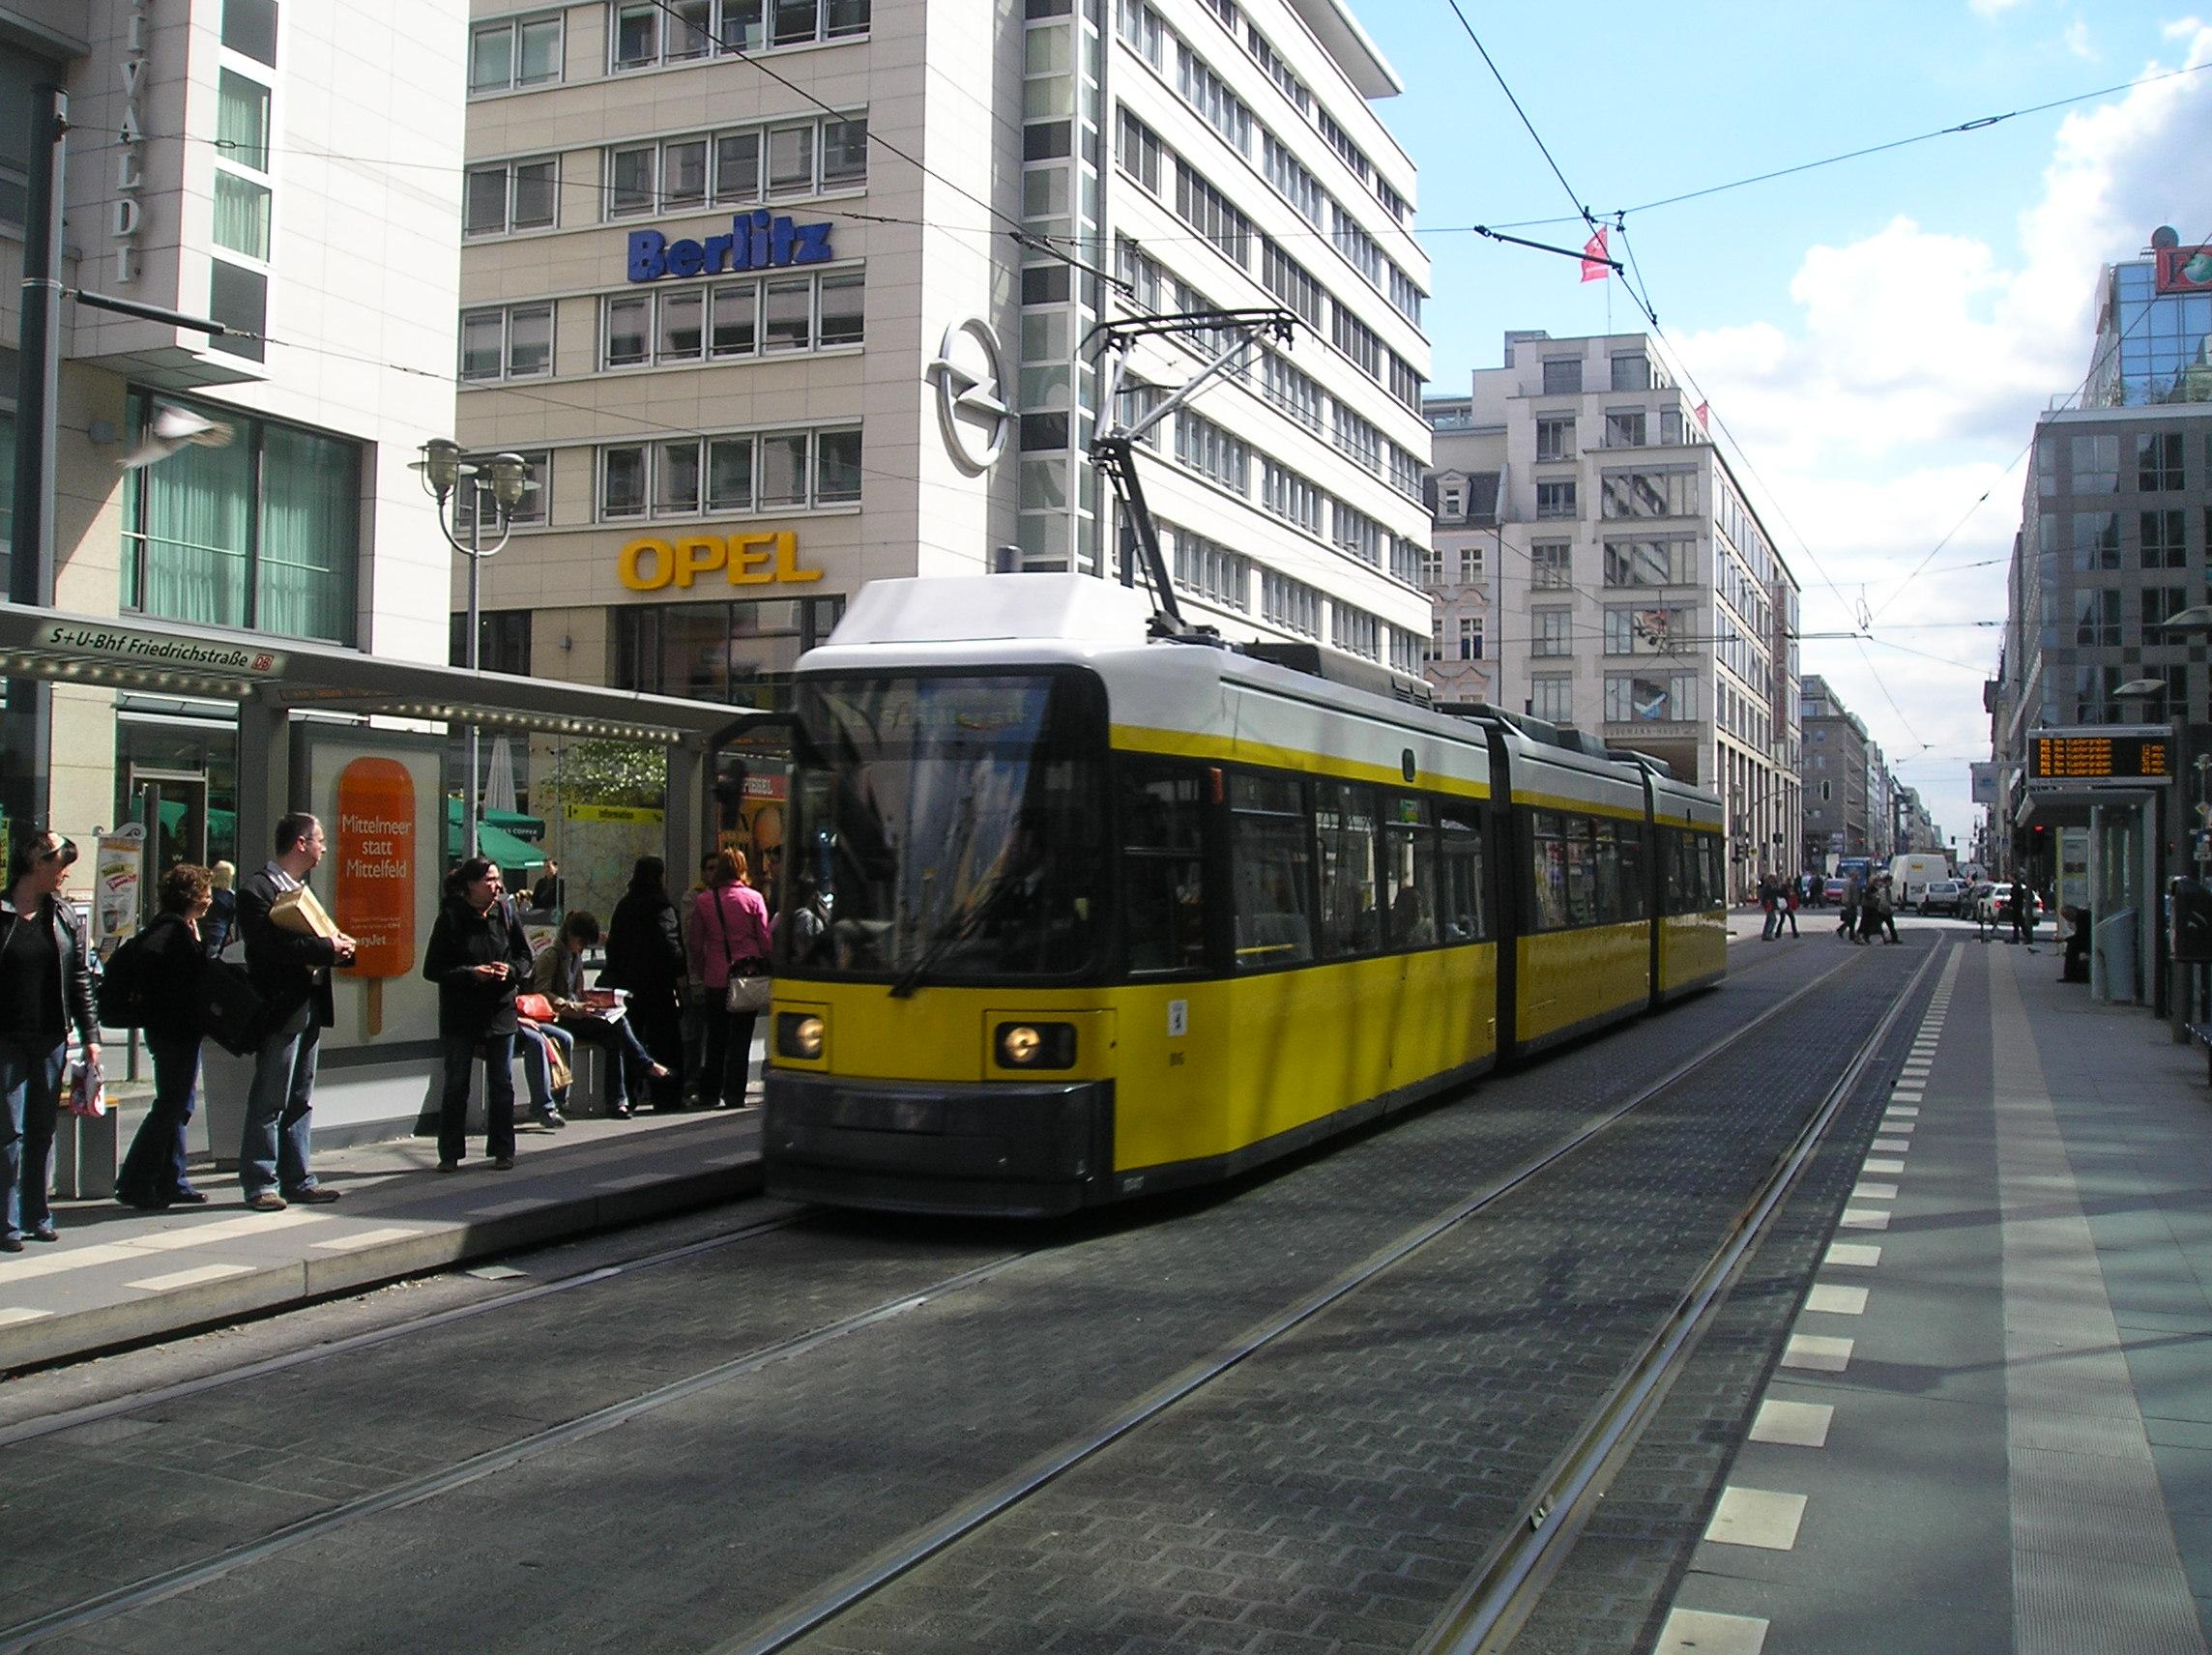 File BVG tram line M1 on Friedrichstraße JPG